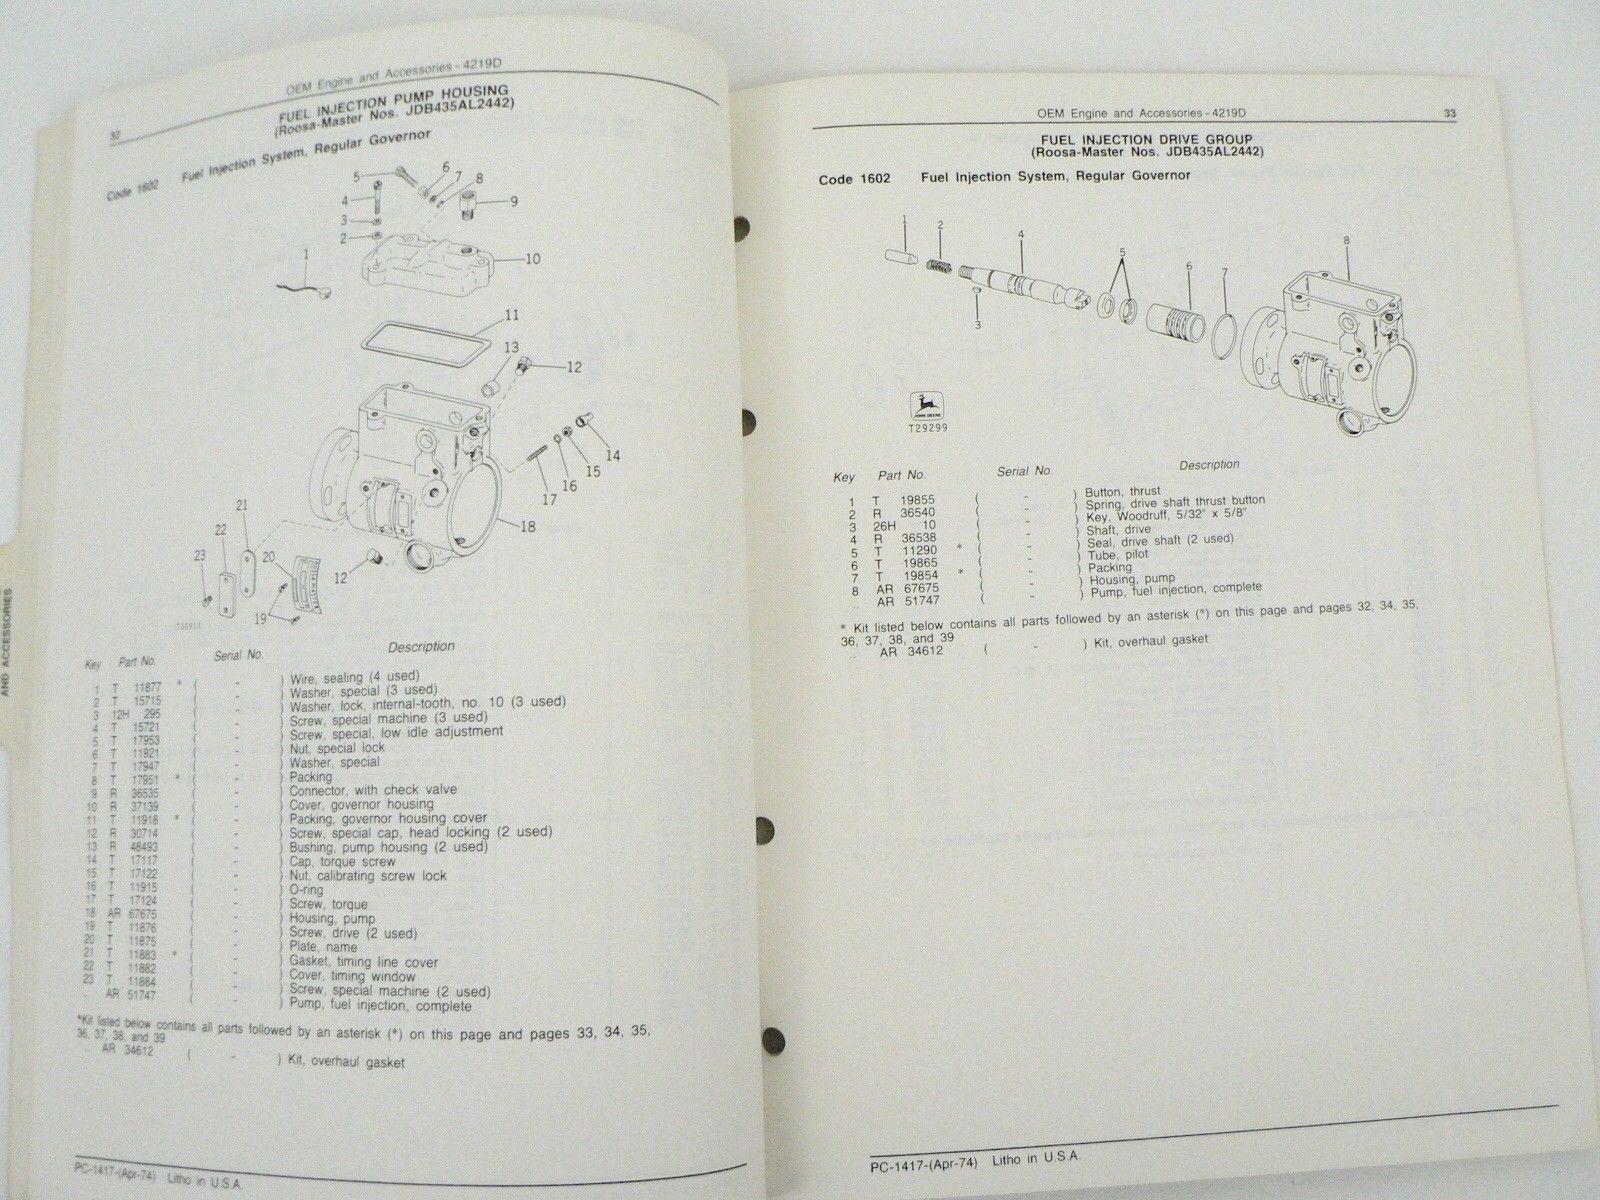 ... John Deere Service Parts List Catalog Manual 4219D OEM Engine &  Accessories 1974